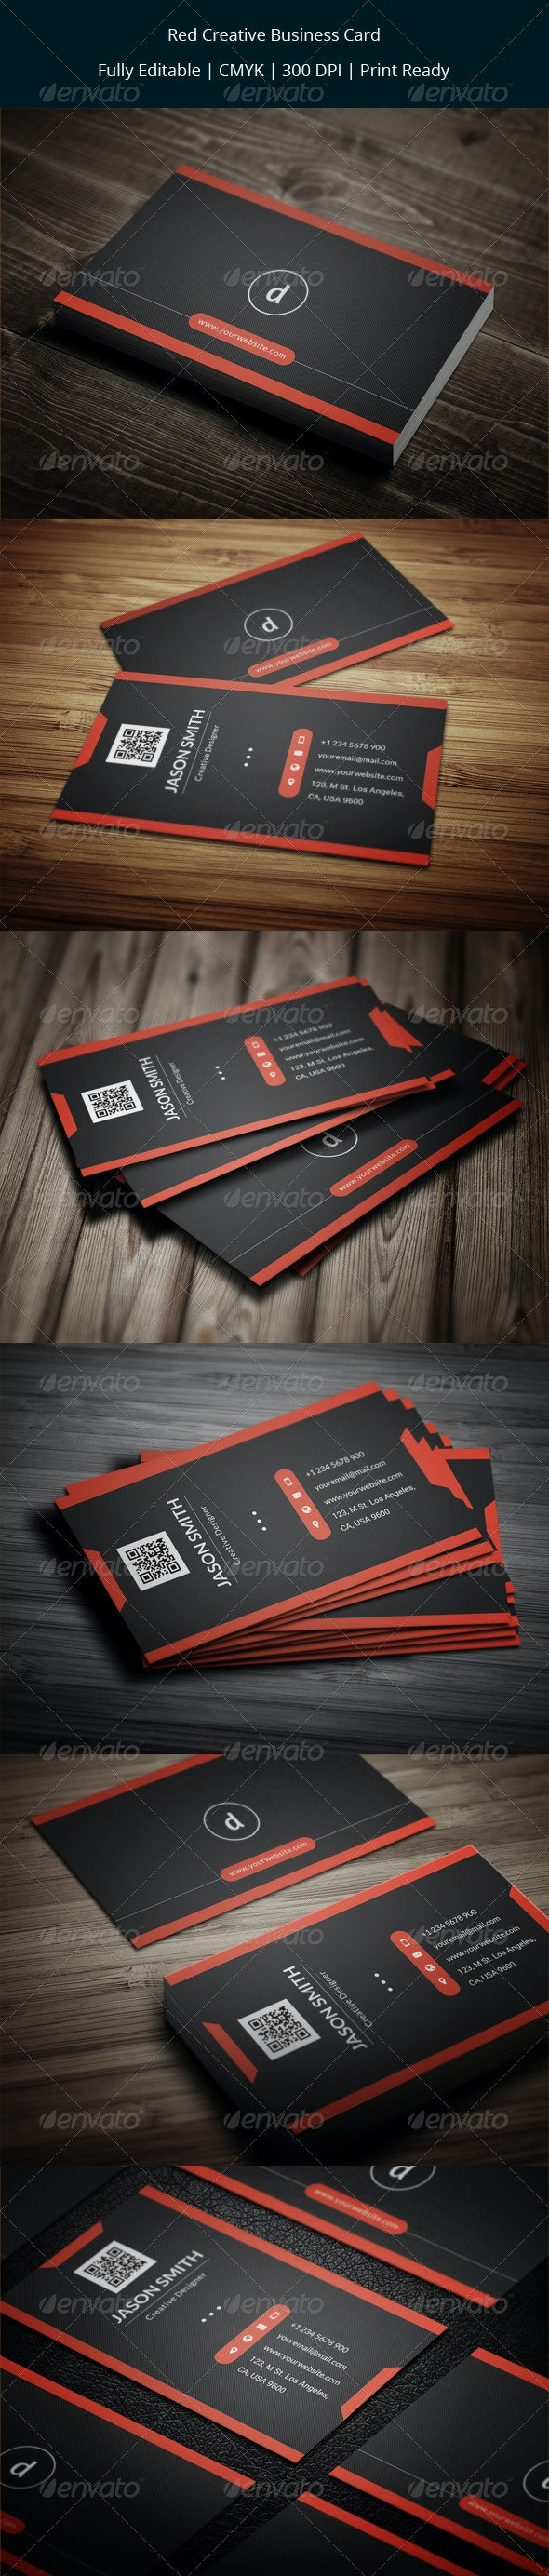 Red Creative Business Card - Creative Business Cards